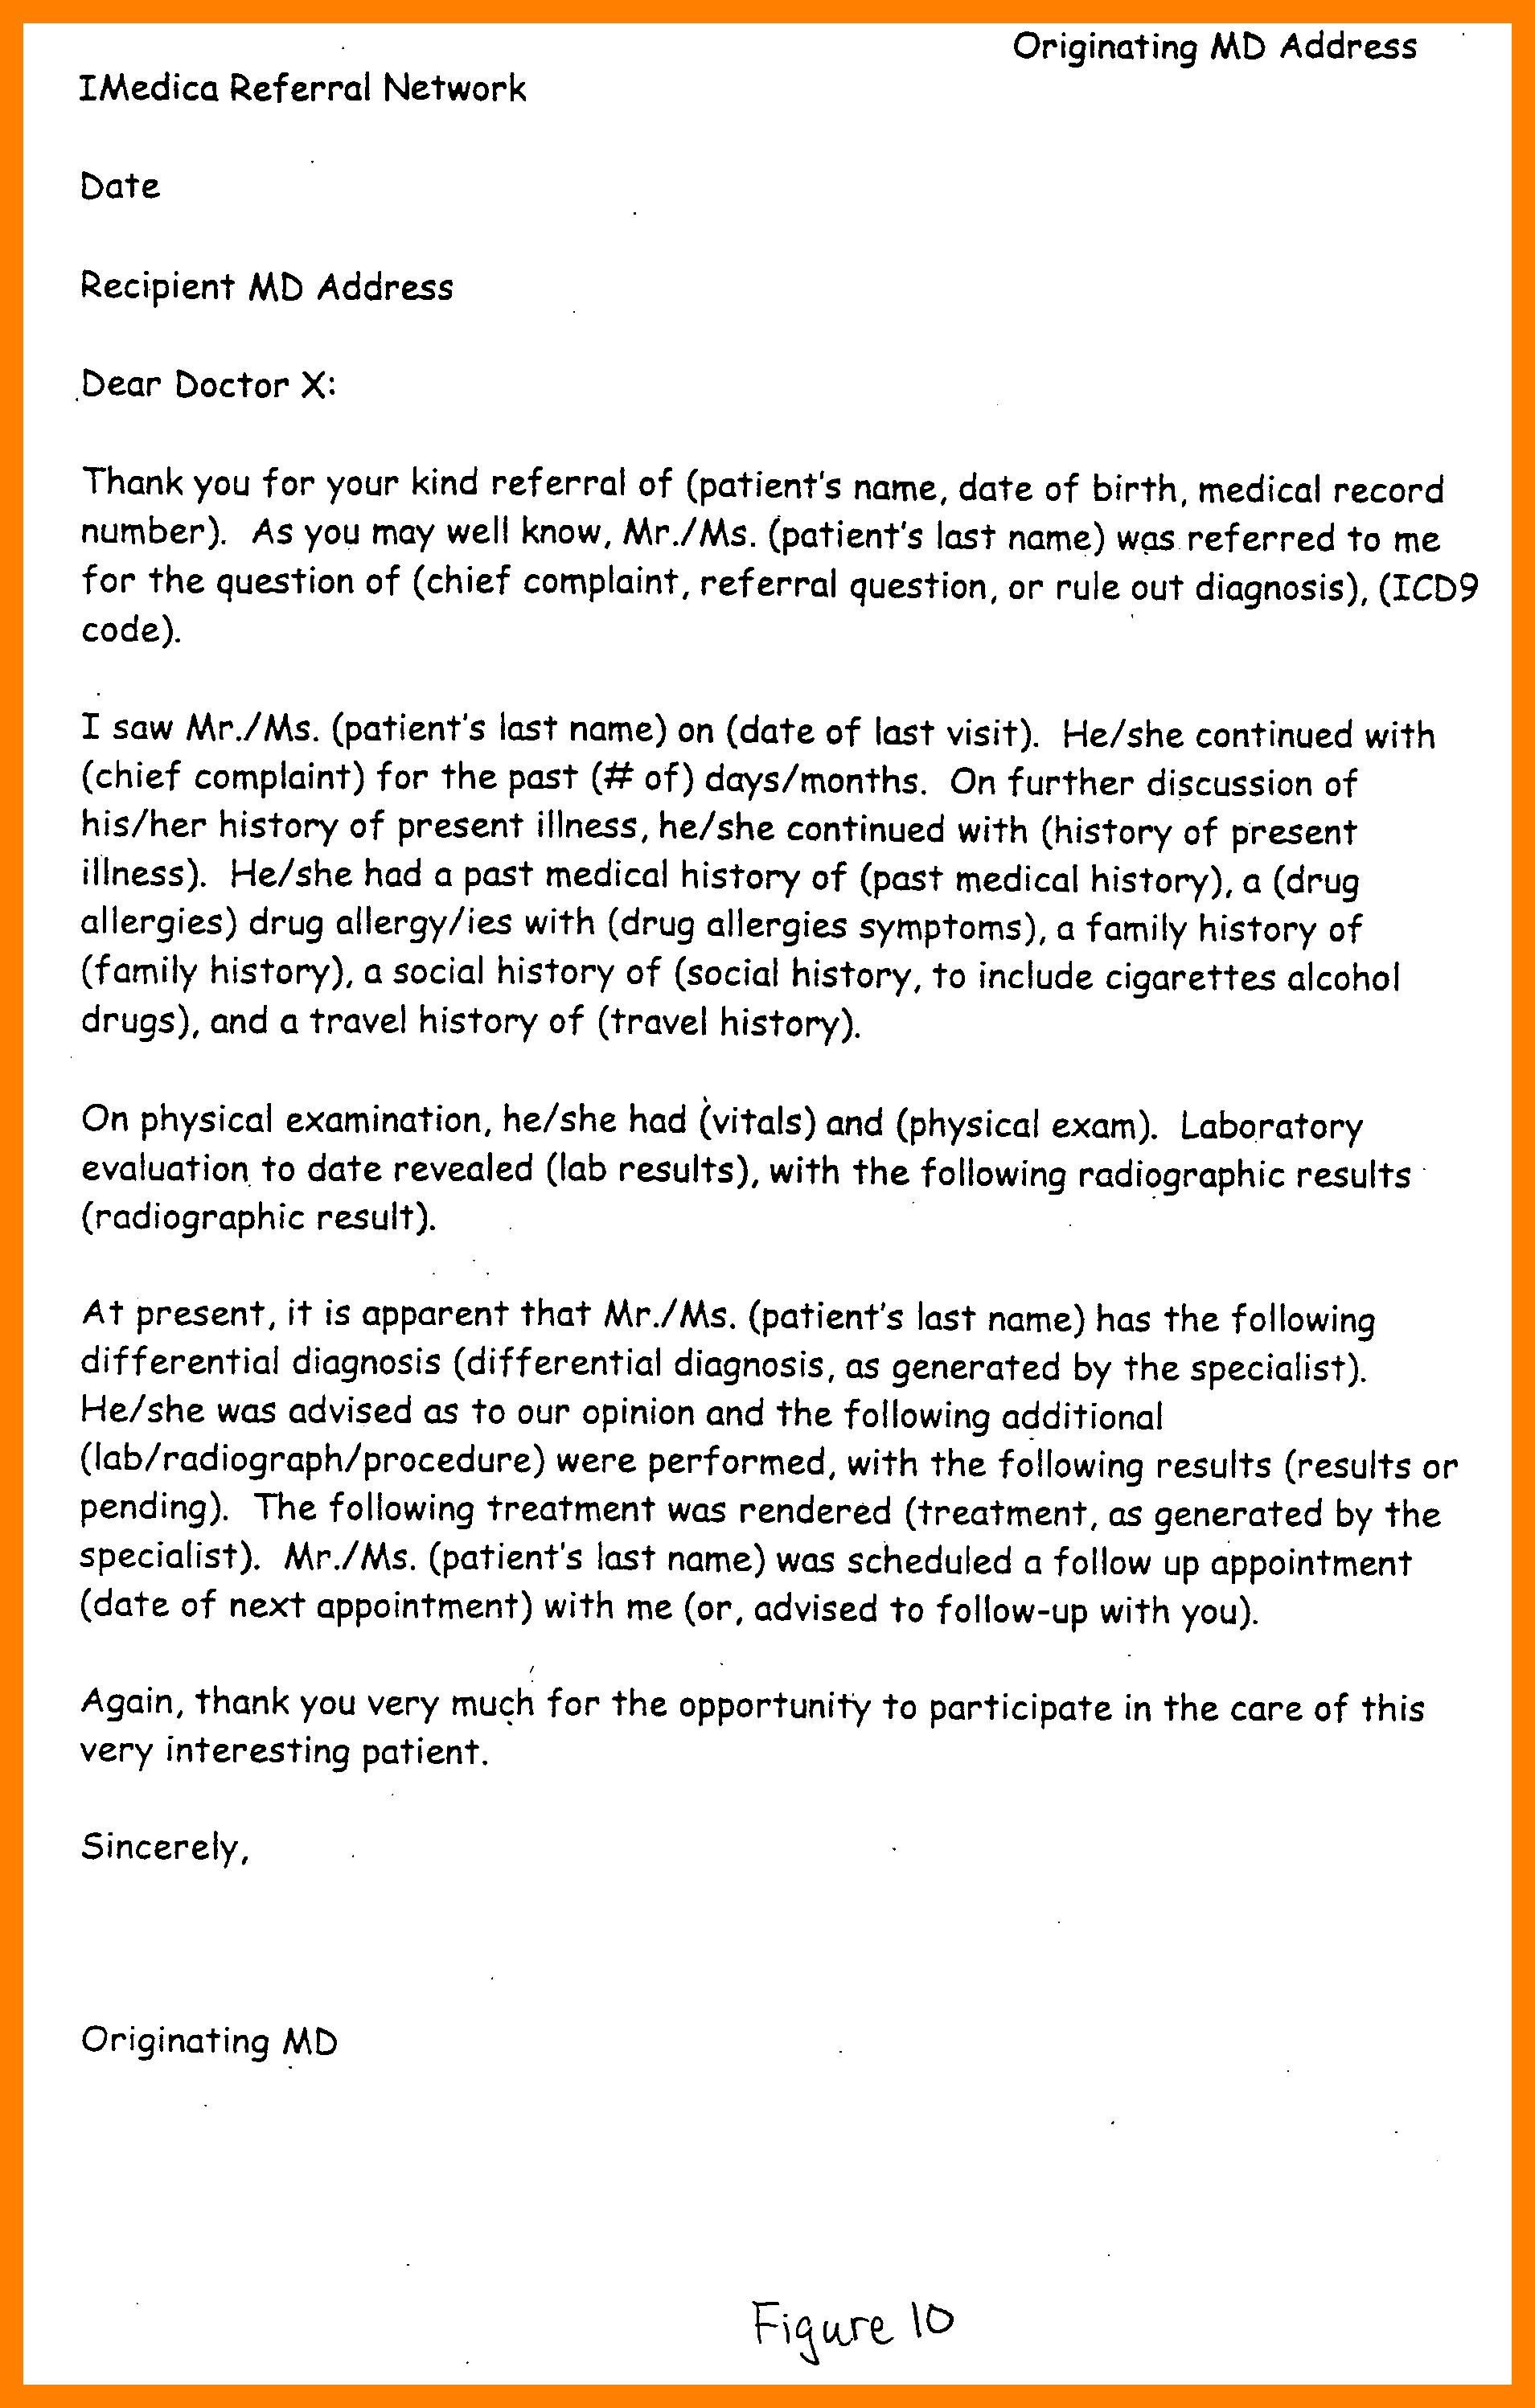 Sample Doctor Referral Letter Template - Re Mendation Letter Template Medical Residency Copy Sample Medical